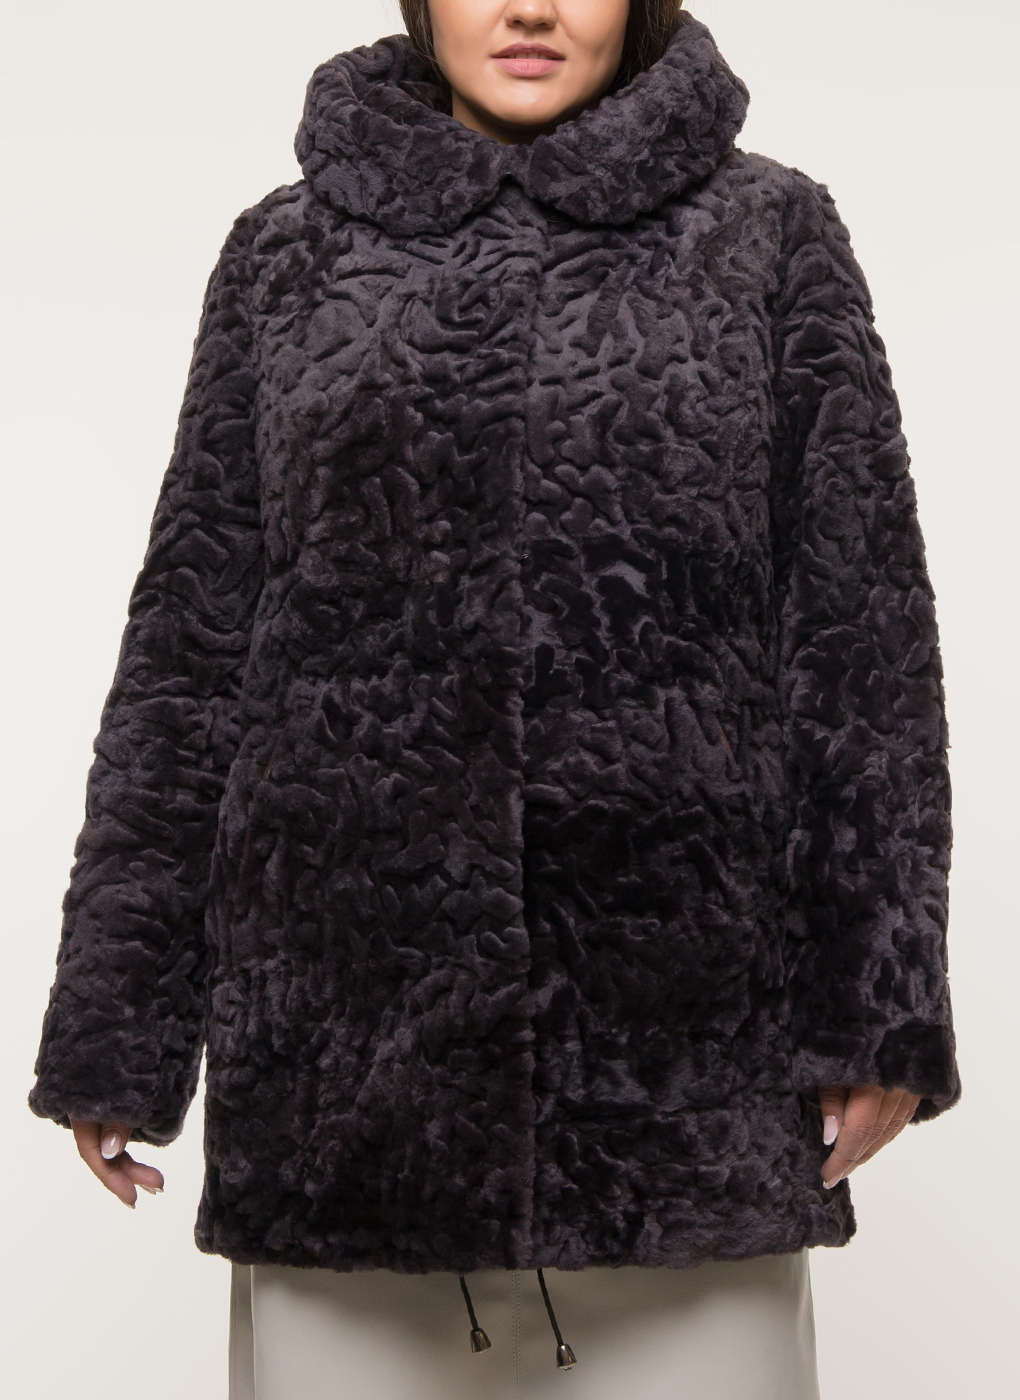 Куртка из овчины прямая 01, Anna Romanova furs фото